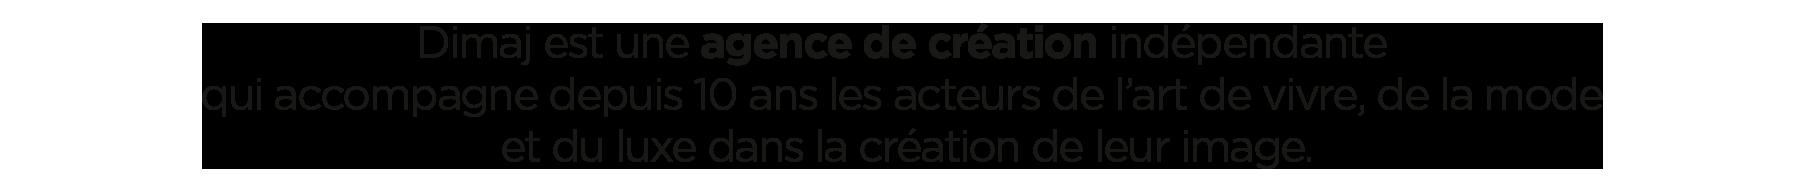 Dimaj agence de création